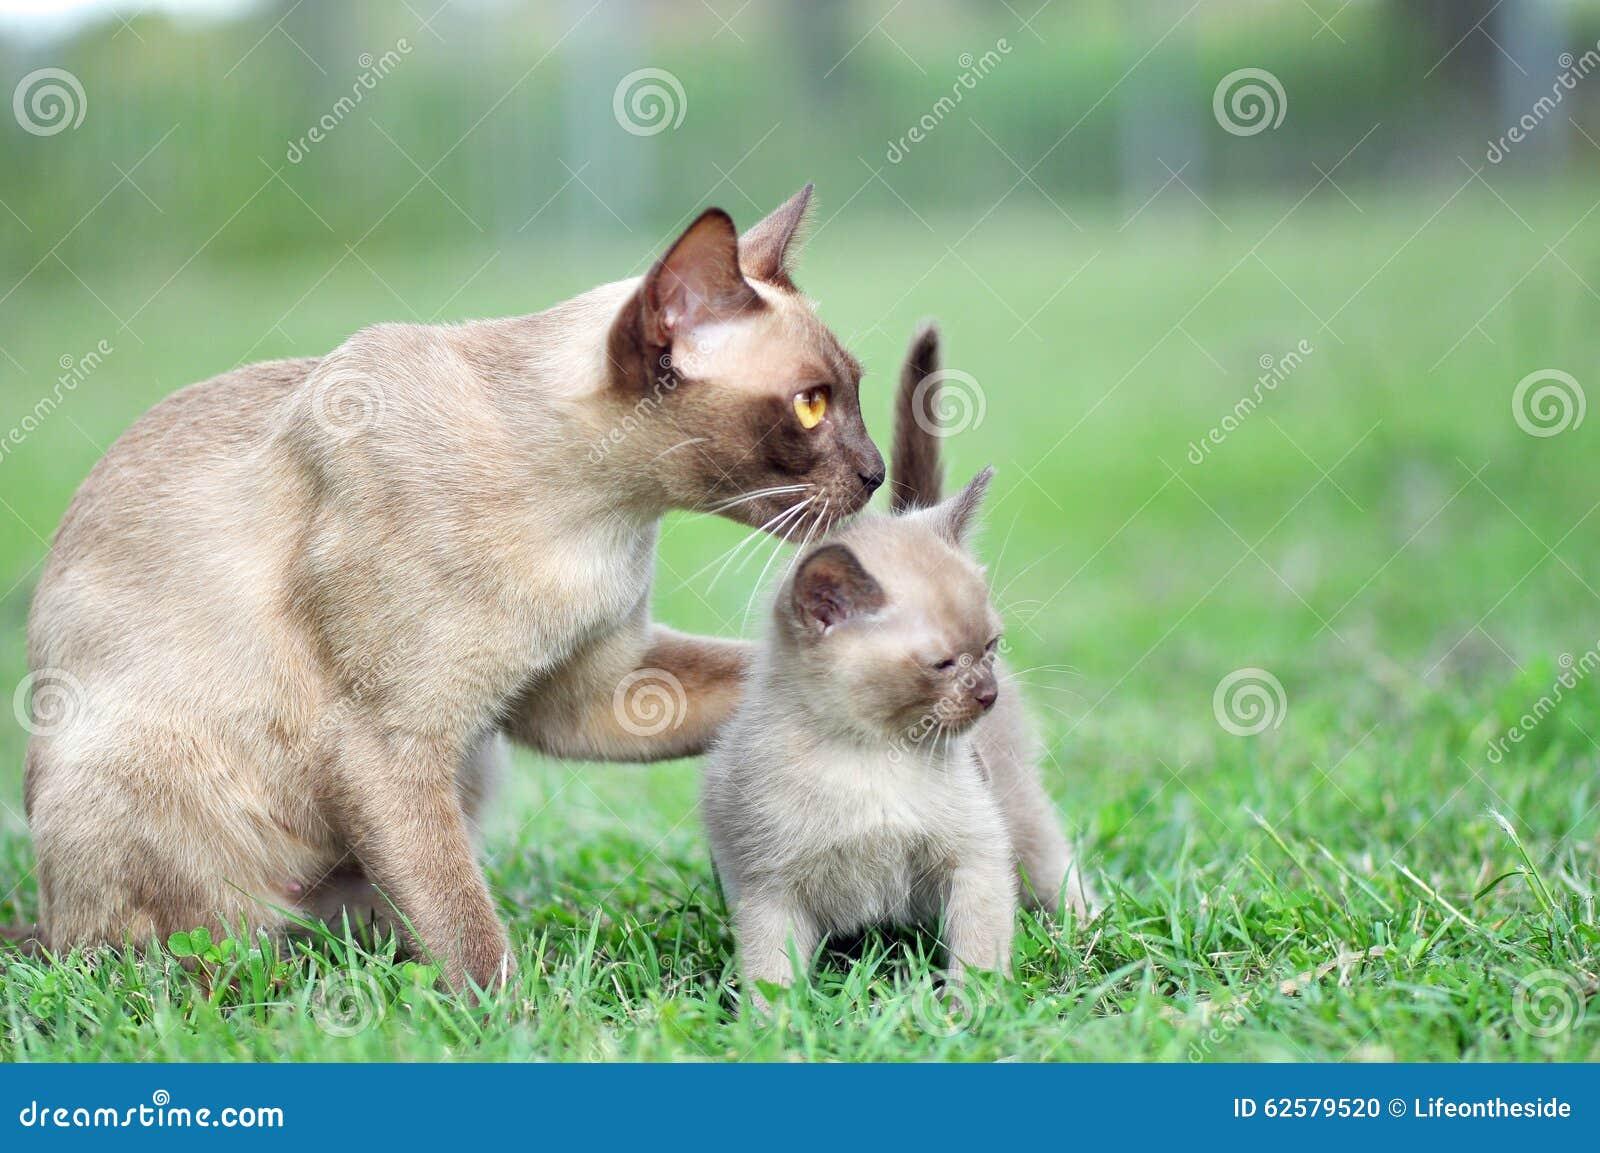 Mother Burmese cat hugging baby affectionately kitten outdoors